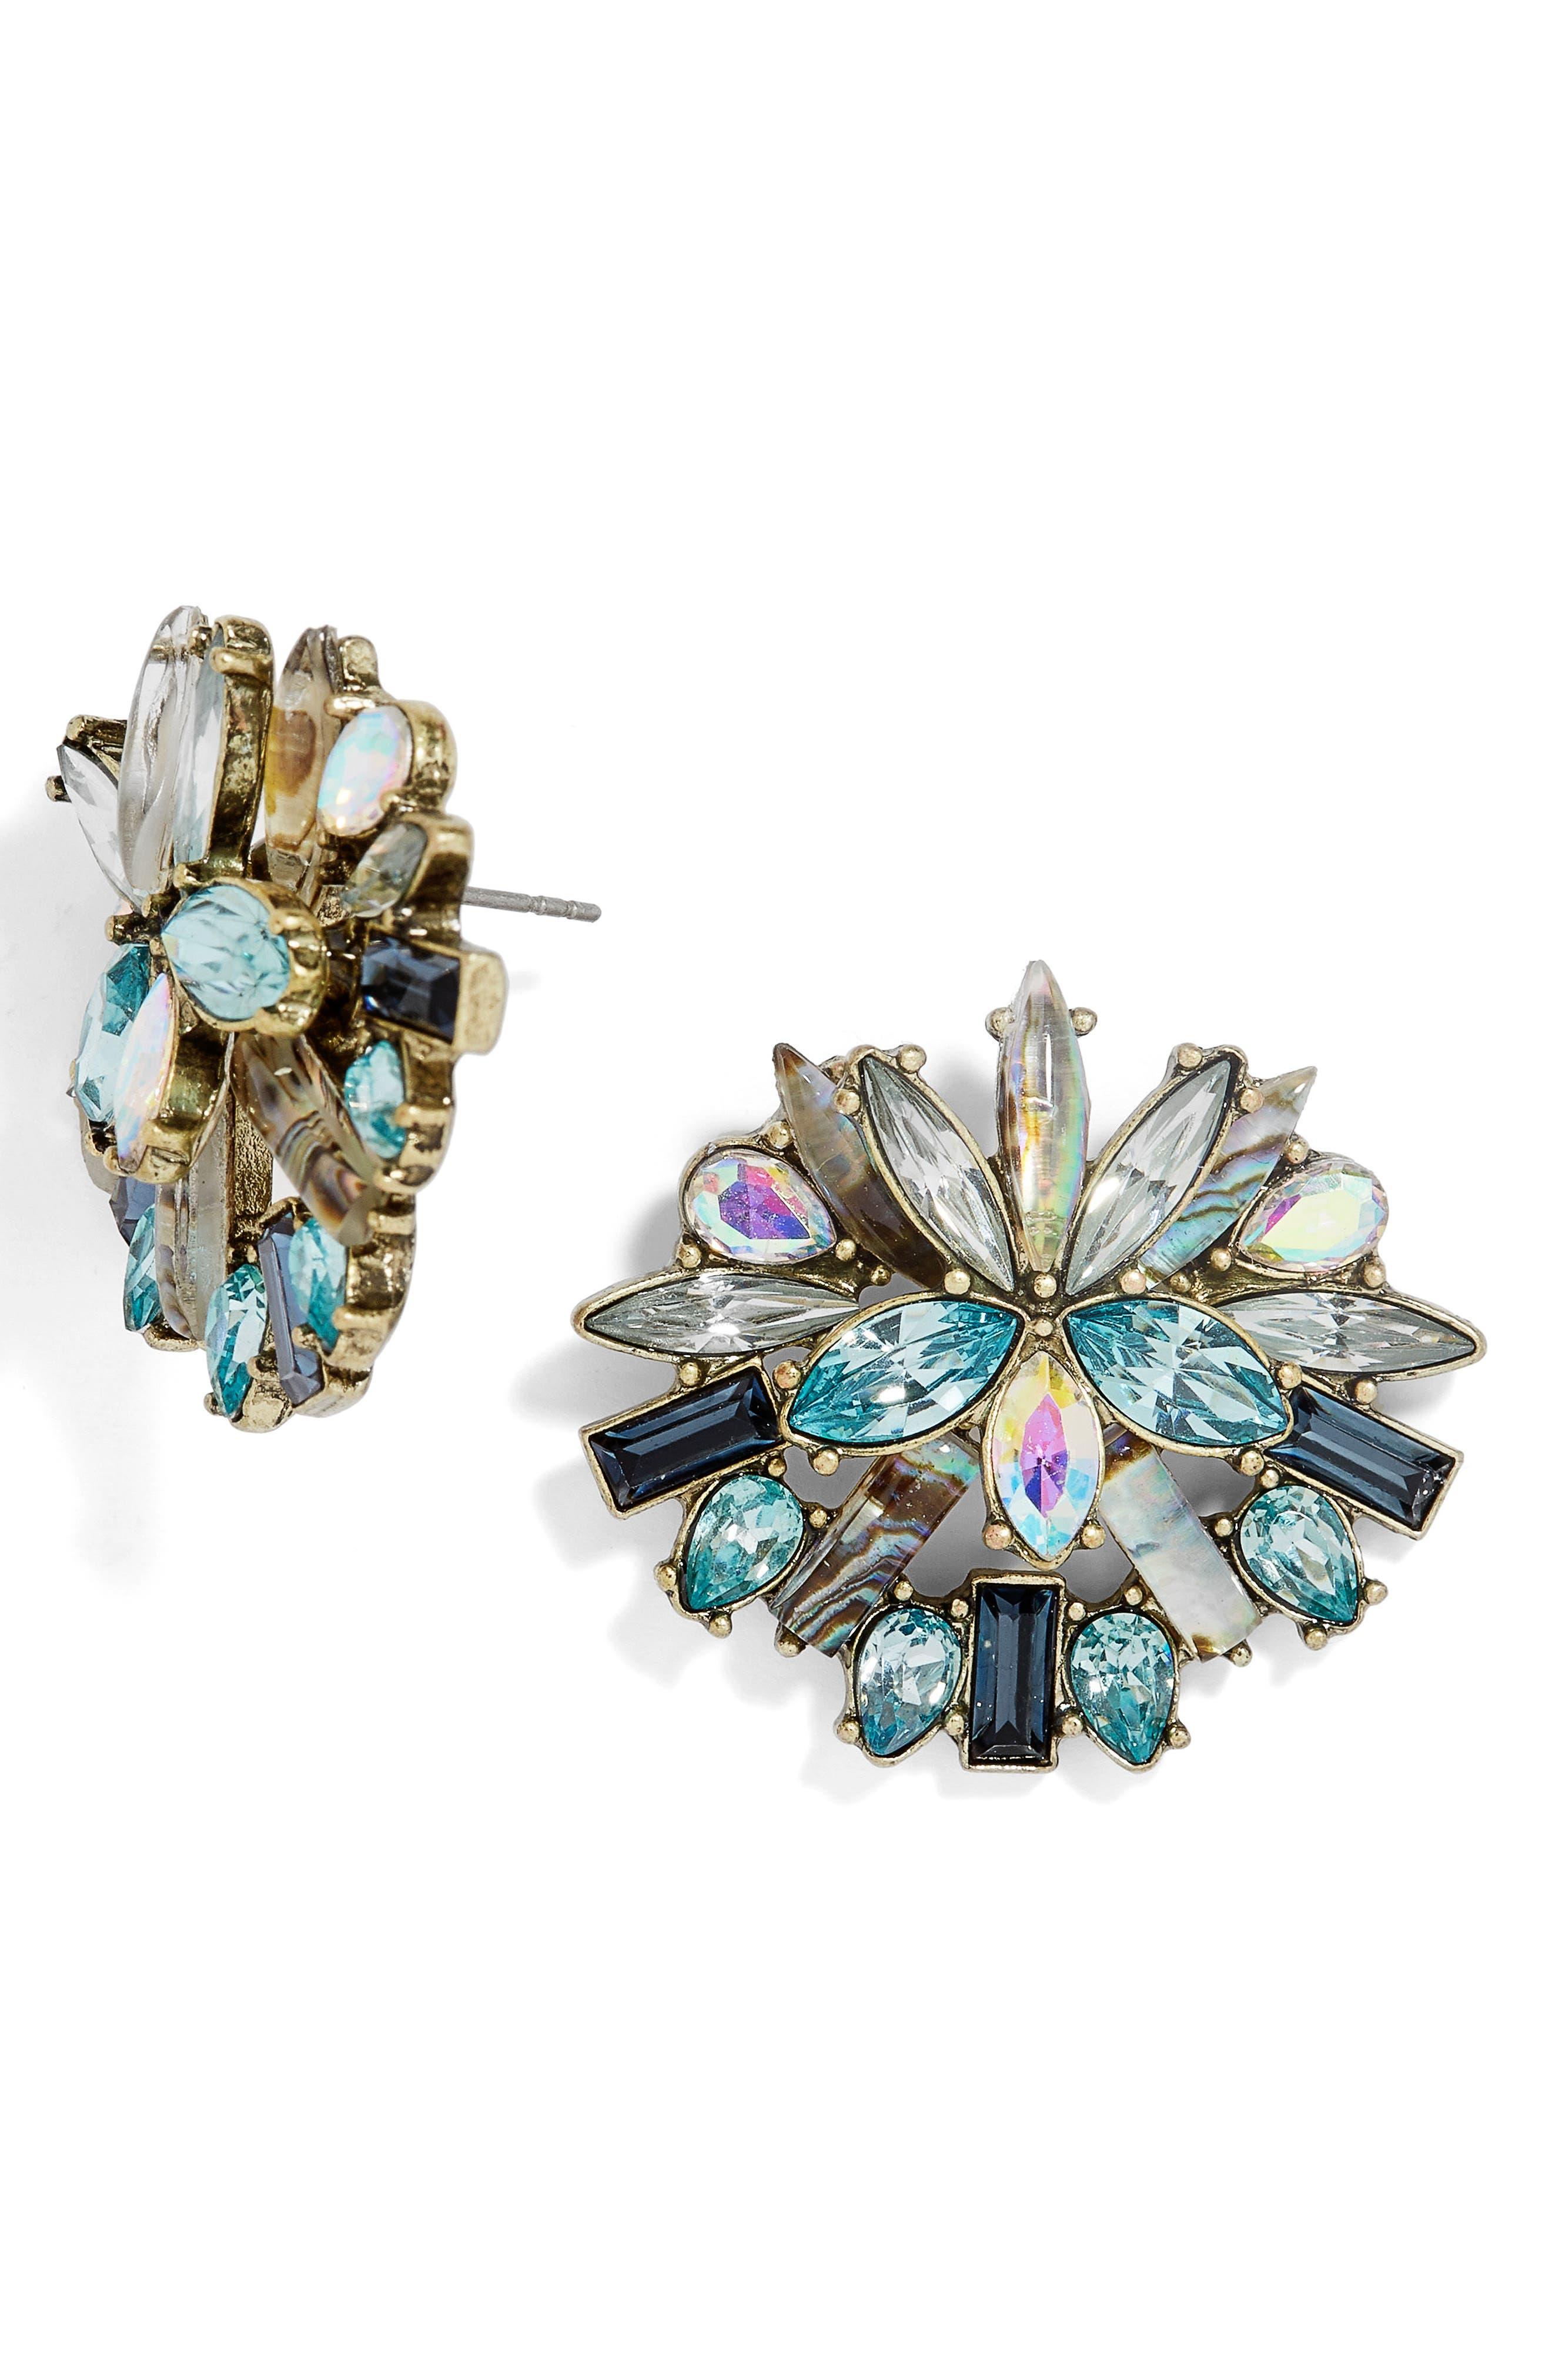 Zaffre Crystal Cluster Stud Earrings,                         Main,                         color, 400